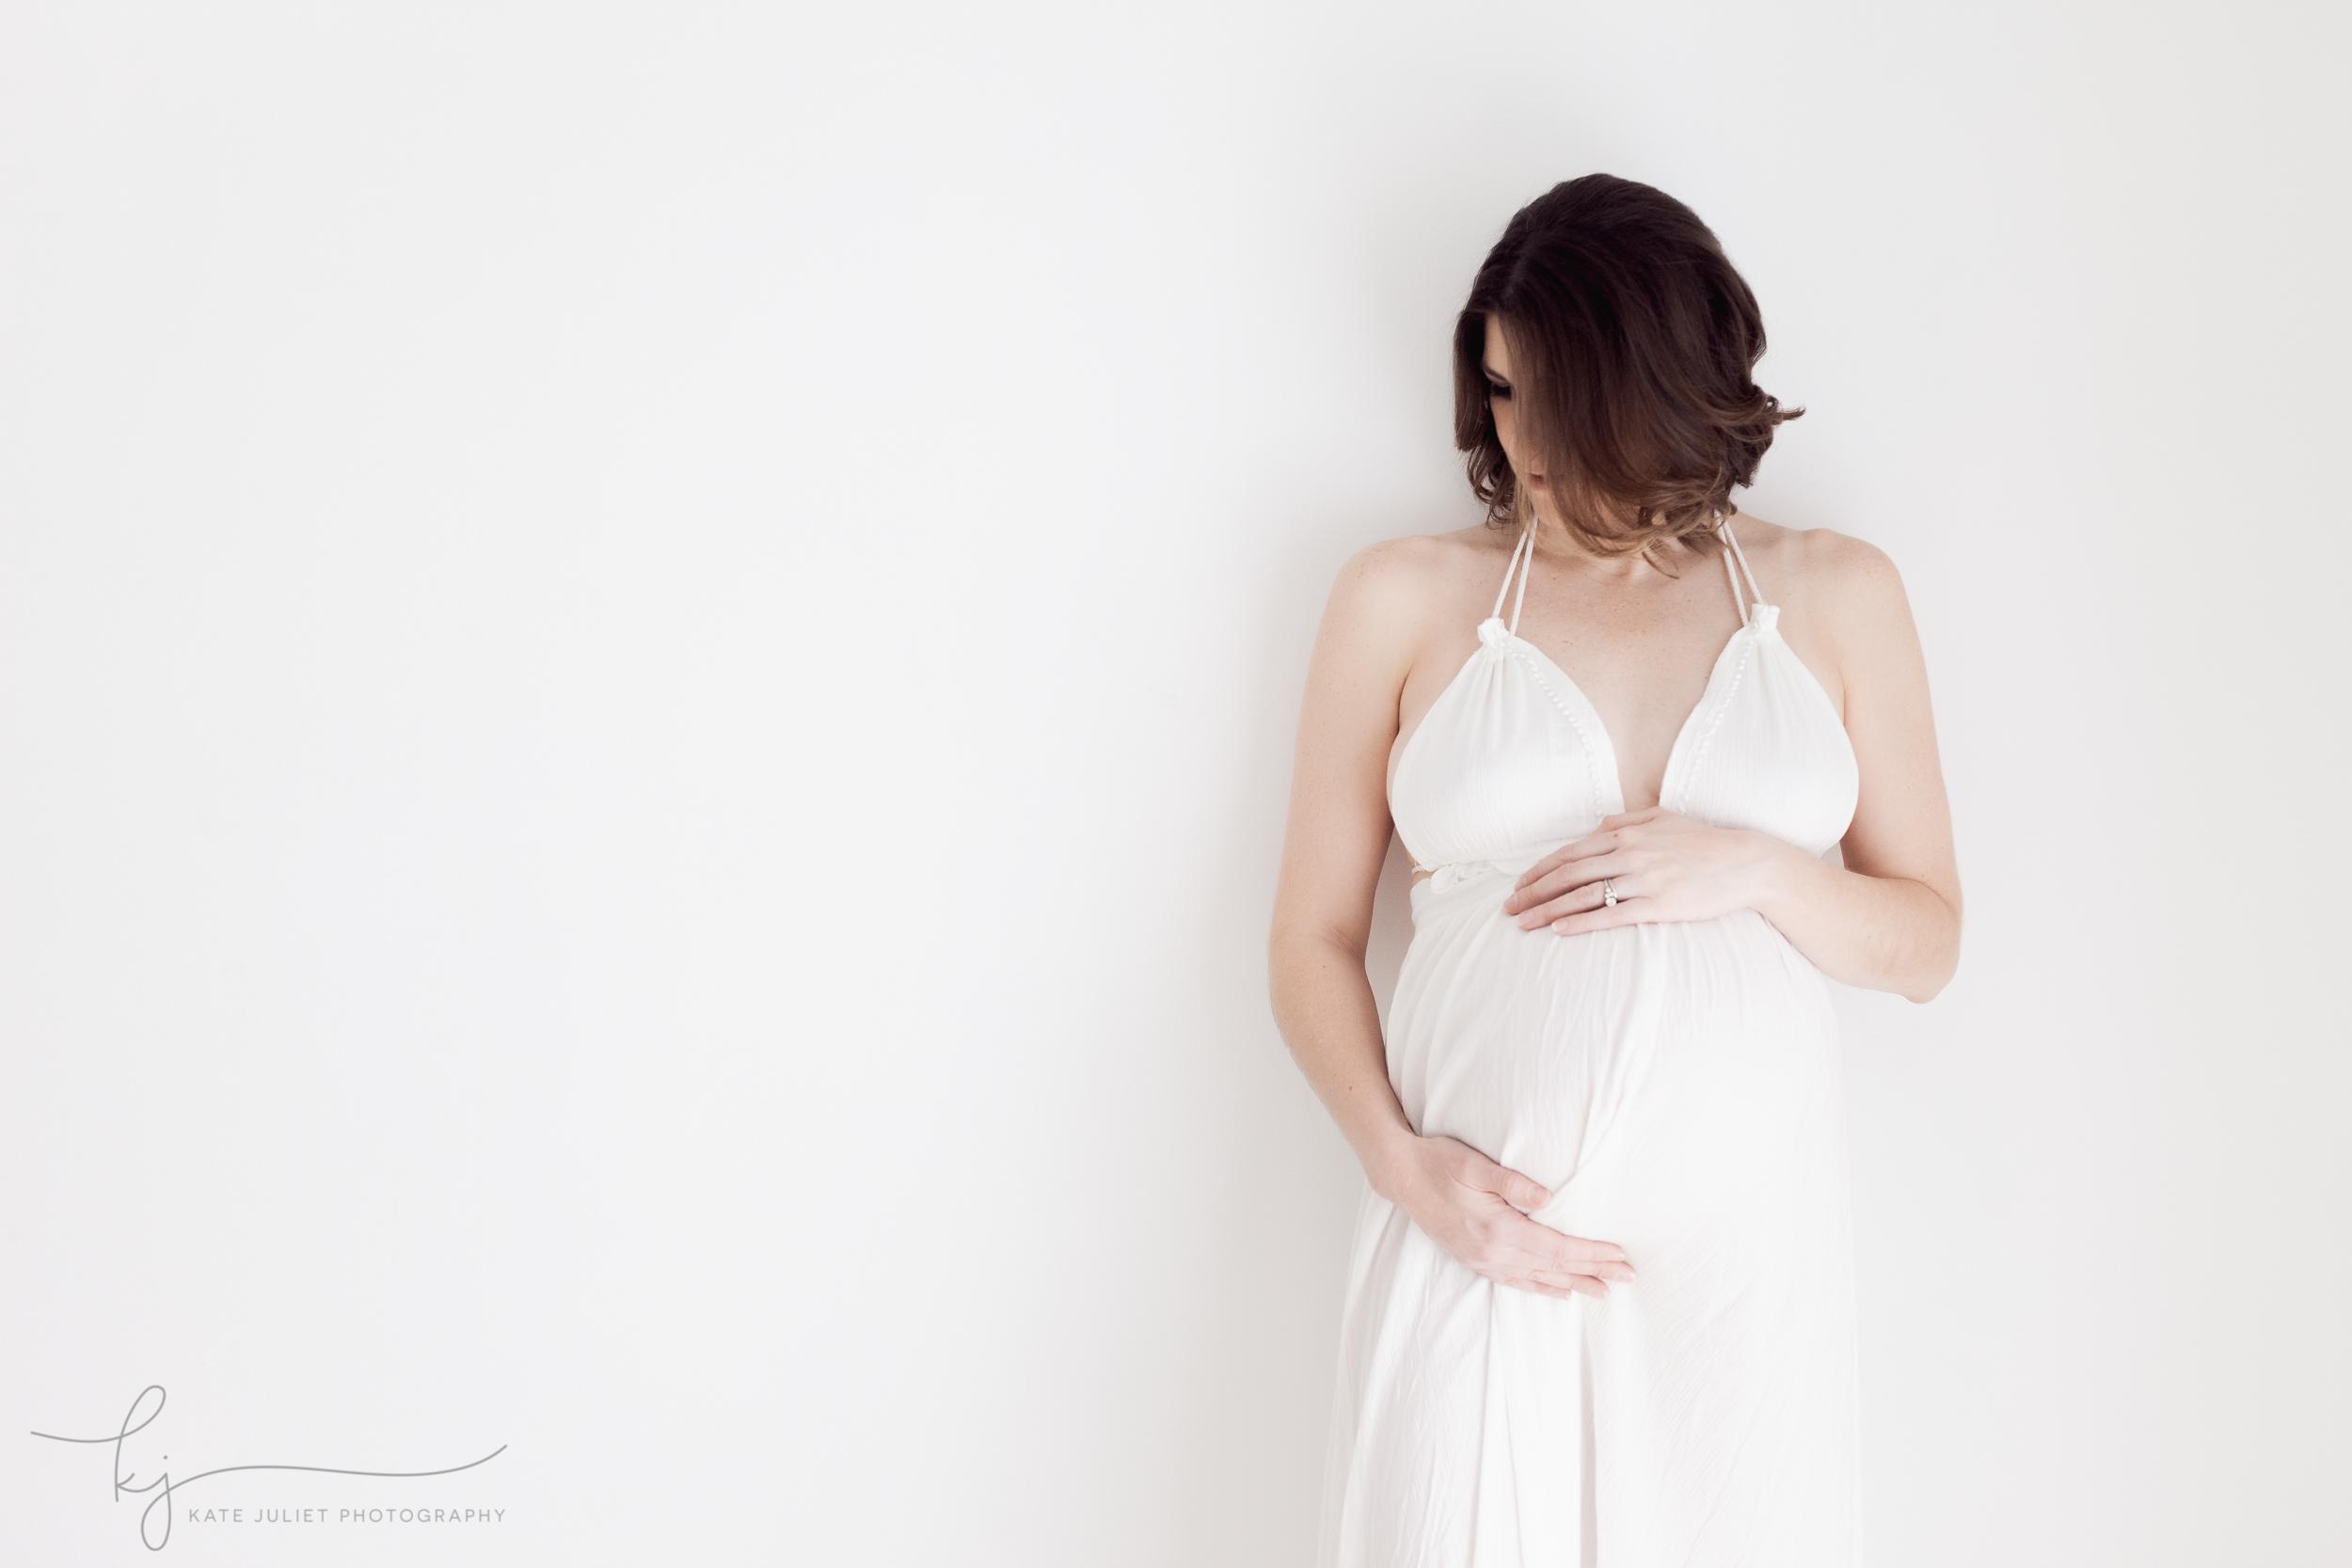 kate_juliet_photography_maternity_arlington_wm-052972.jpg